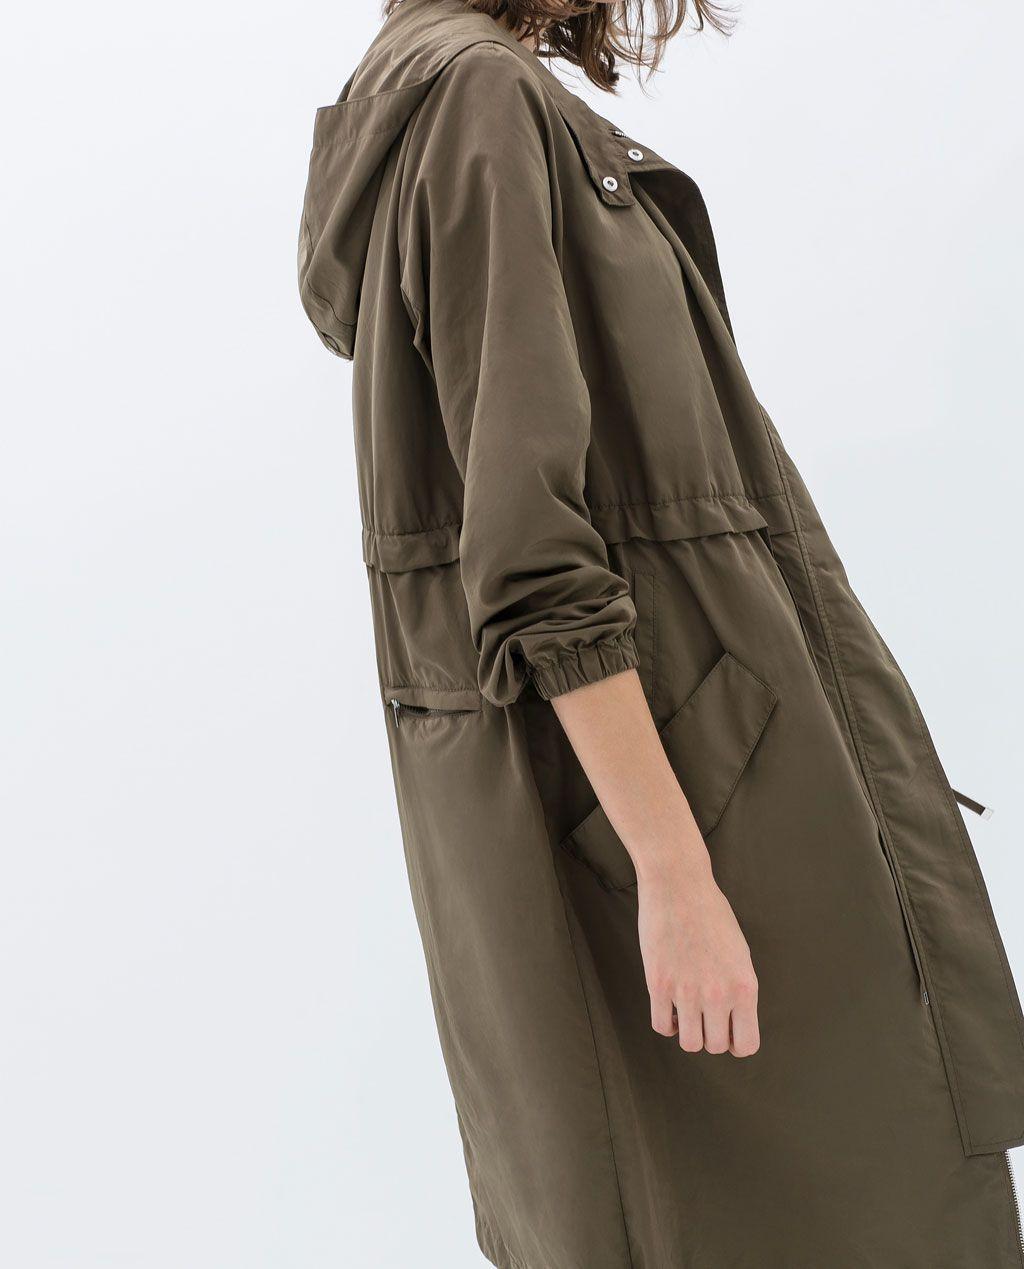 318db987216f5 summer weight Khaki Trench Coat, Parka, Camo, Duster Coat, Ukraine, Dressing